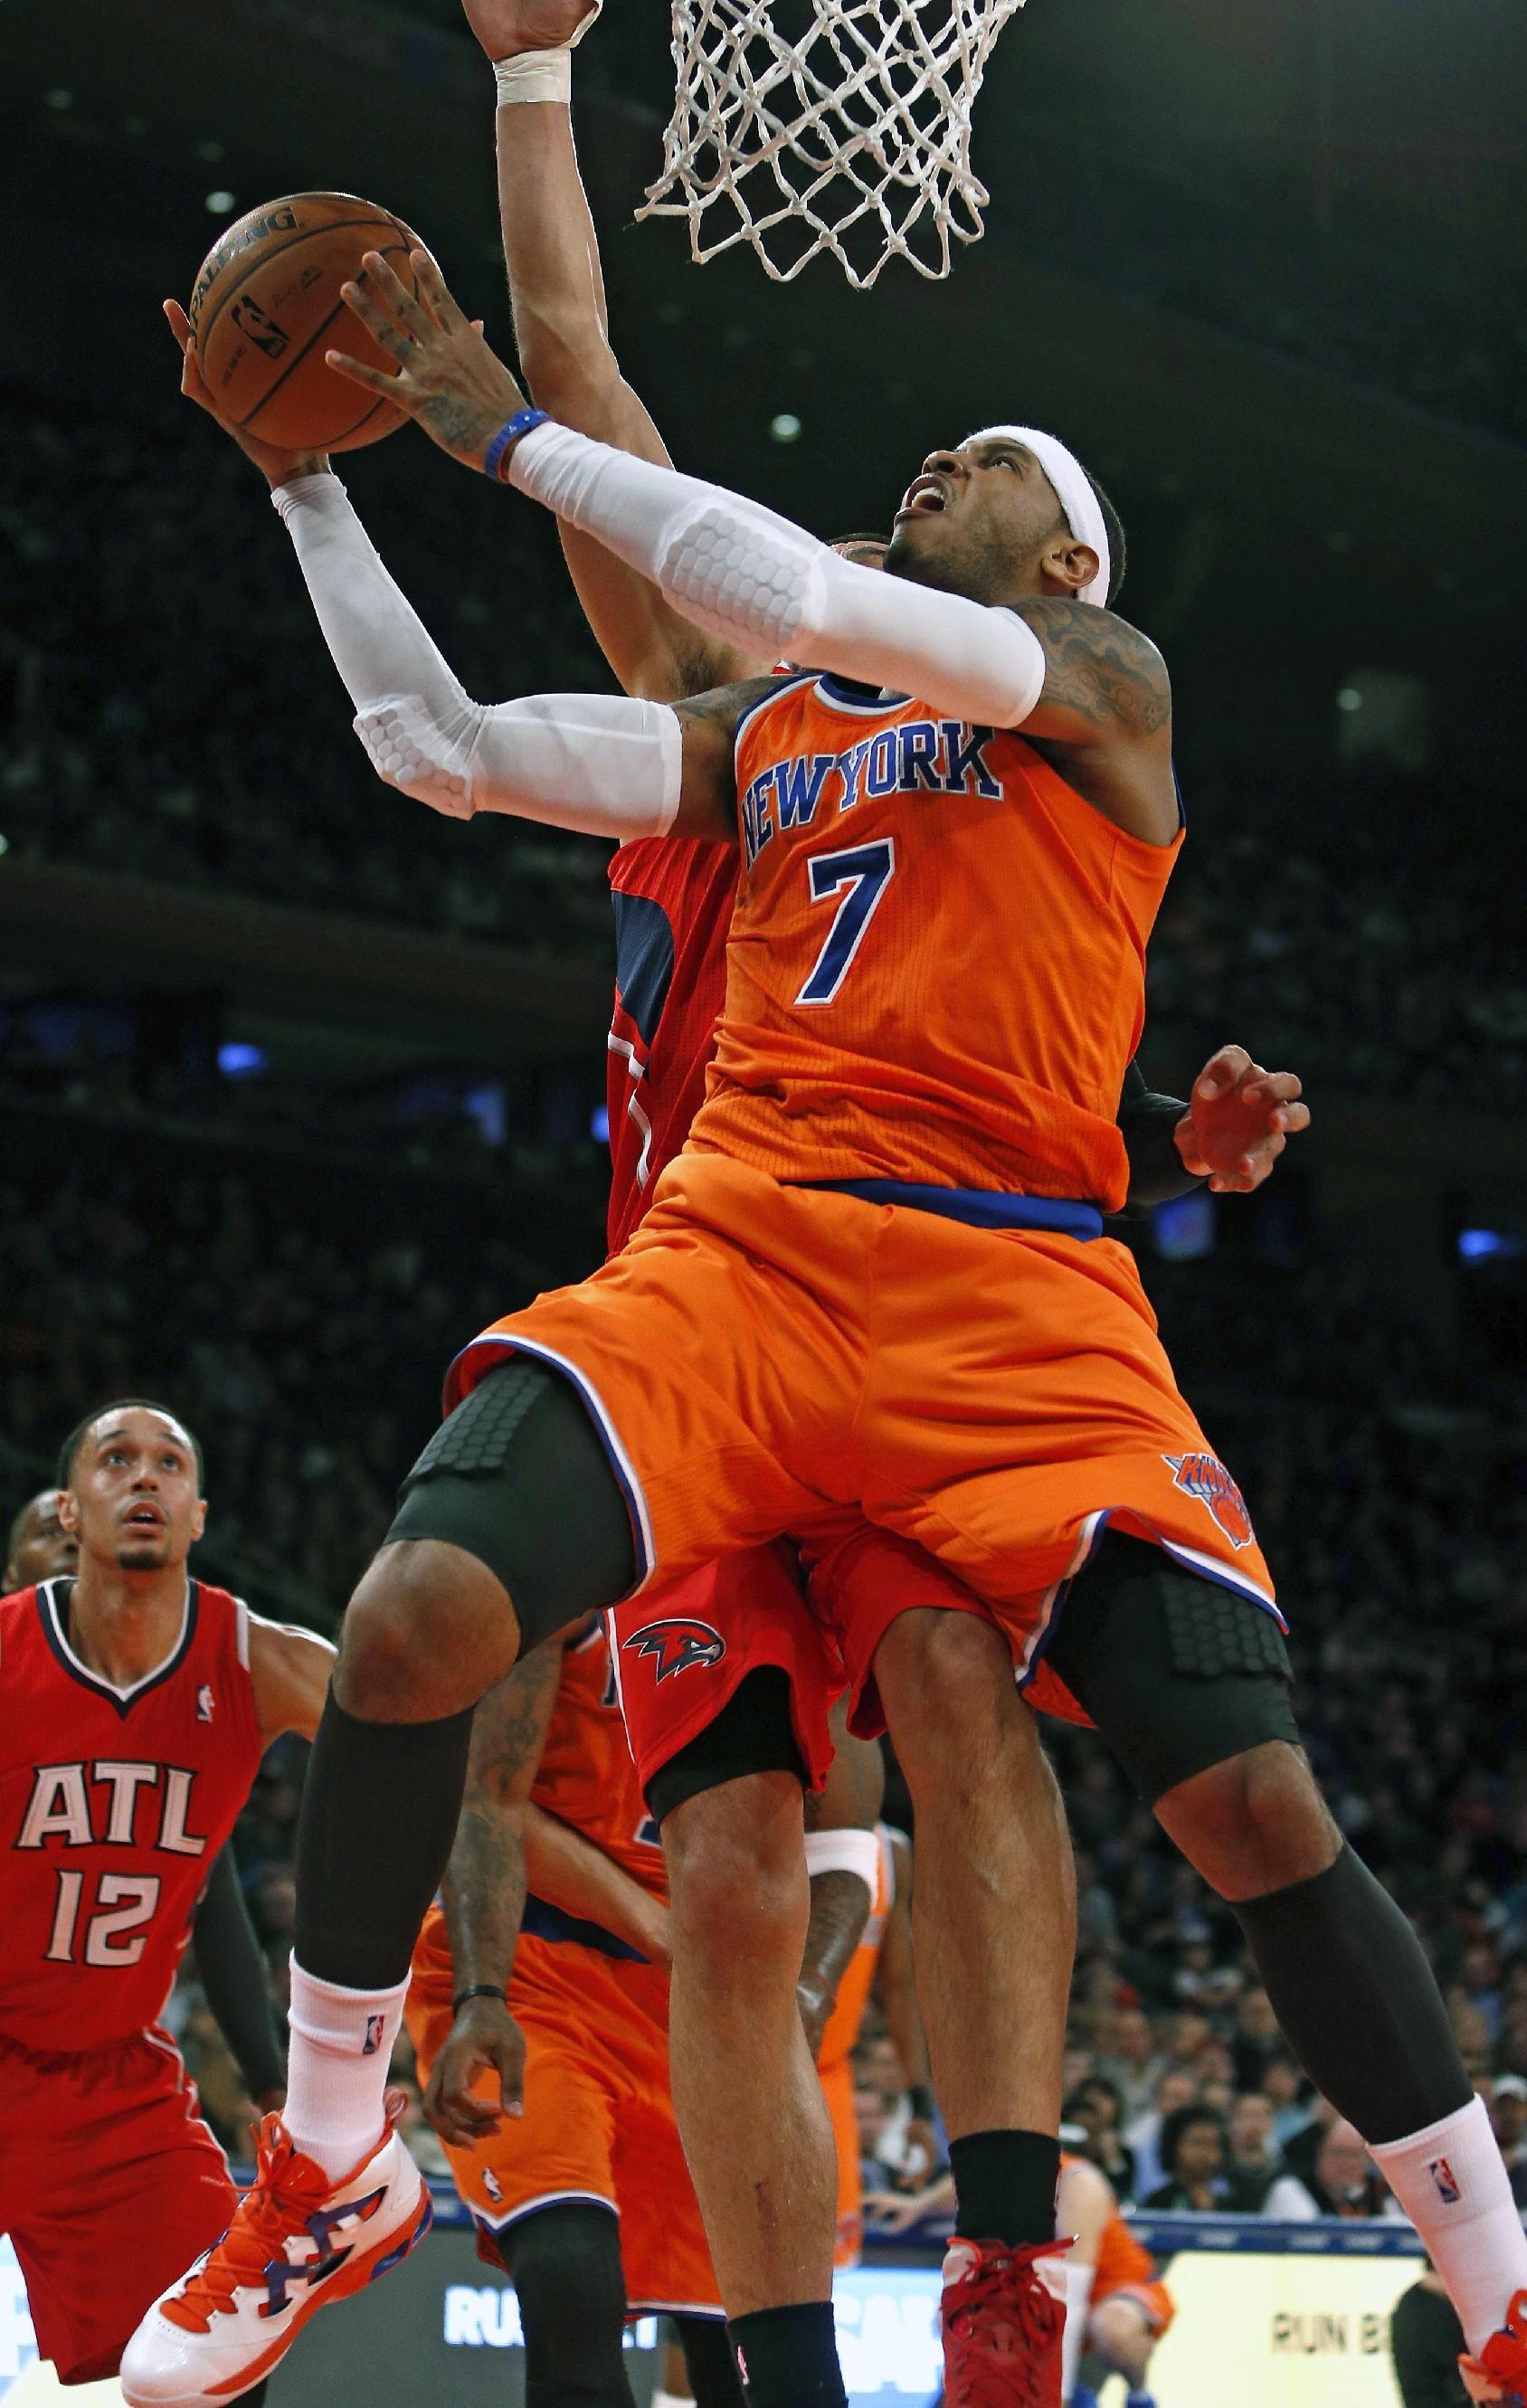 New York Knicks' Carmelo Anthony (7) shoots against